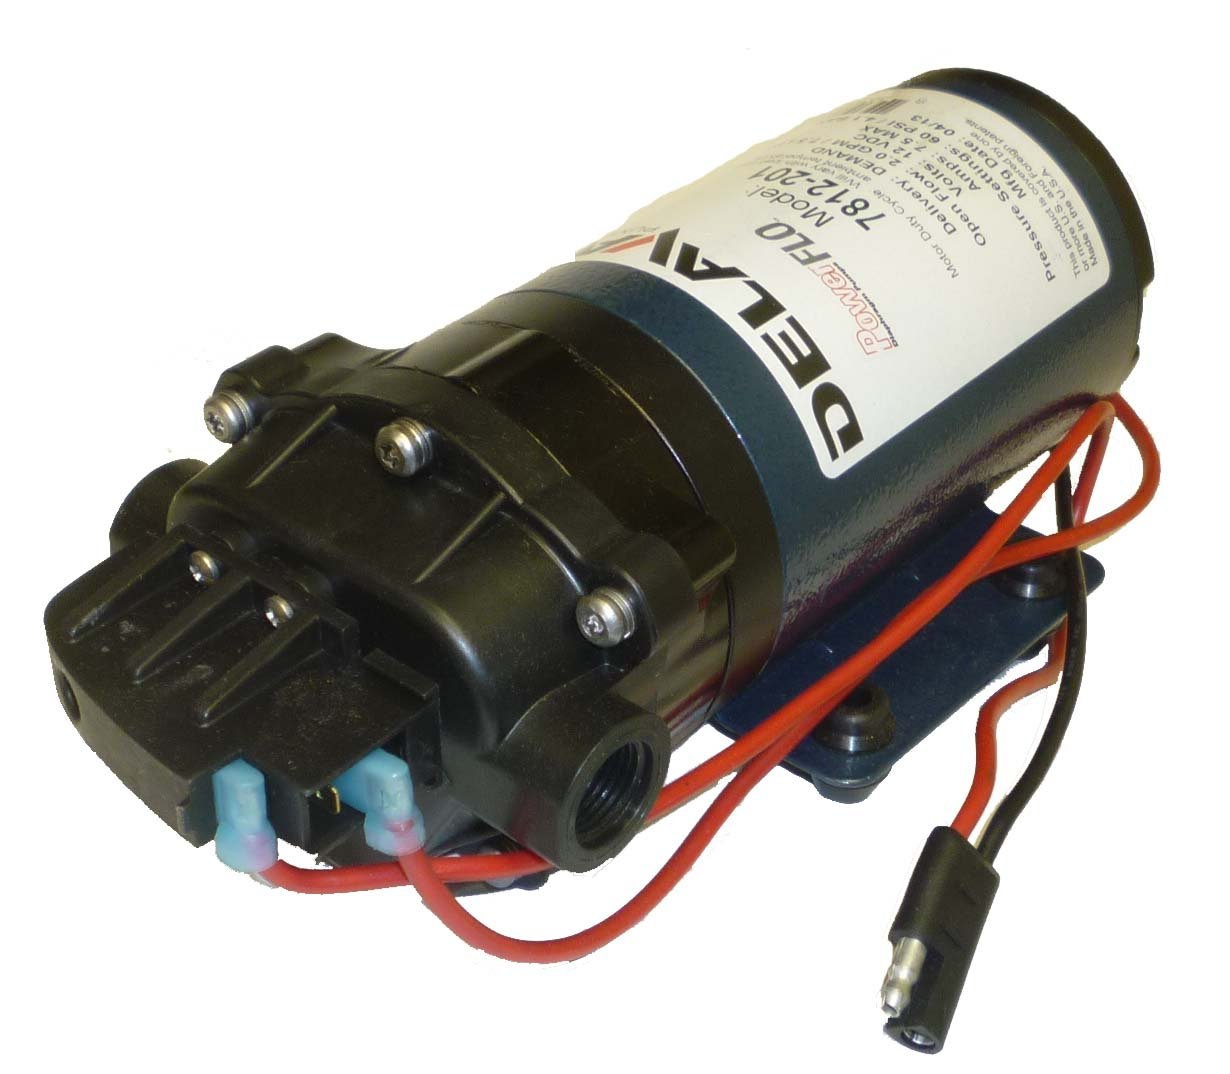 Delavan 7800 Series Diaphragm Pump 12V, 60 PSI, 2.0 GPM, Deman Pump - Power  Water Pumps - Amazon.com